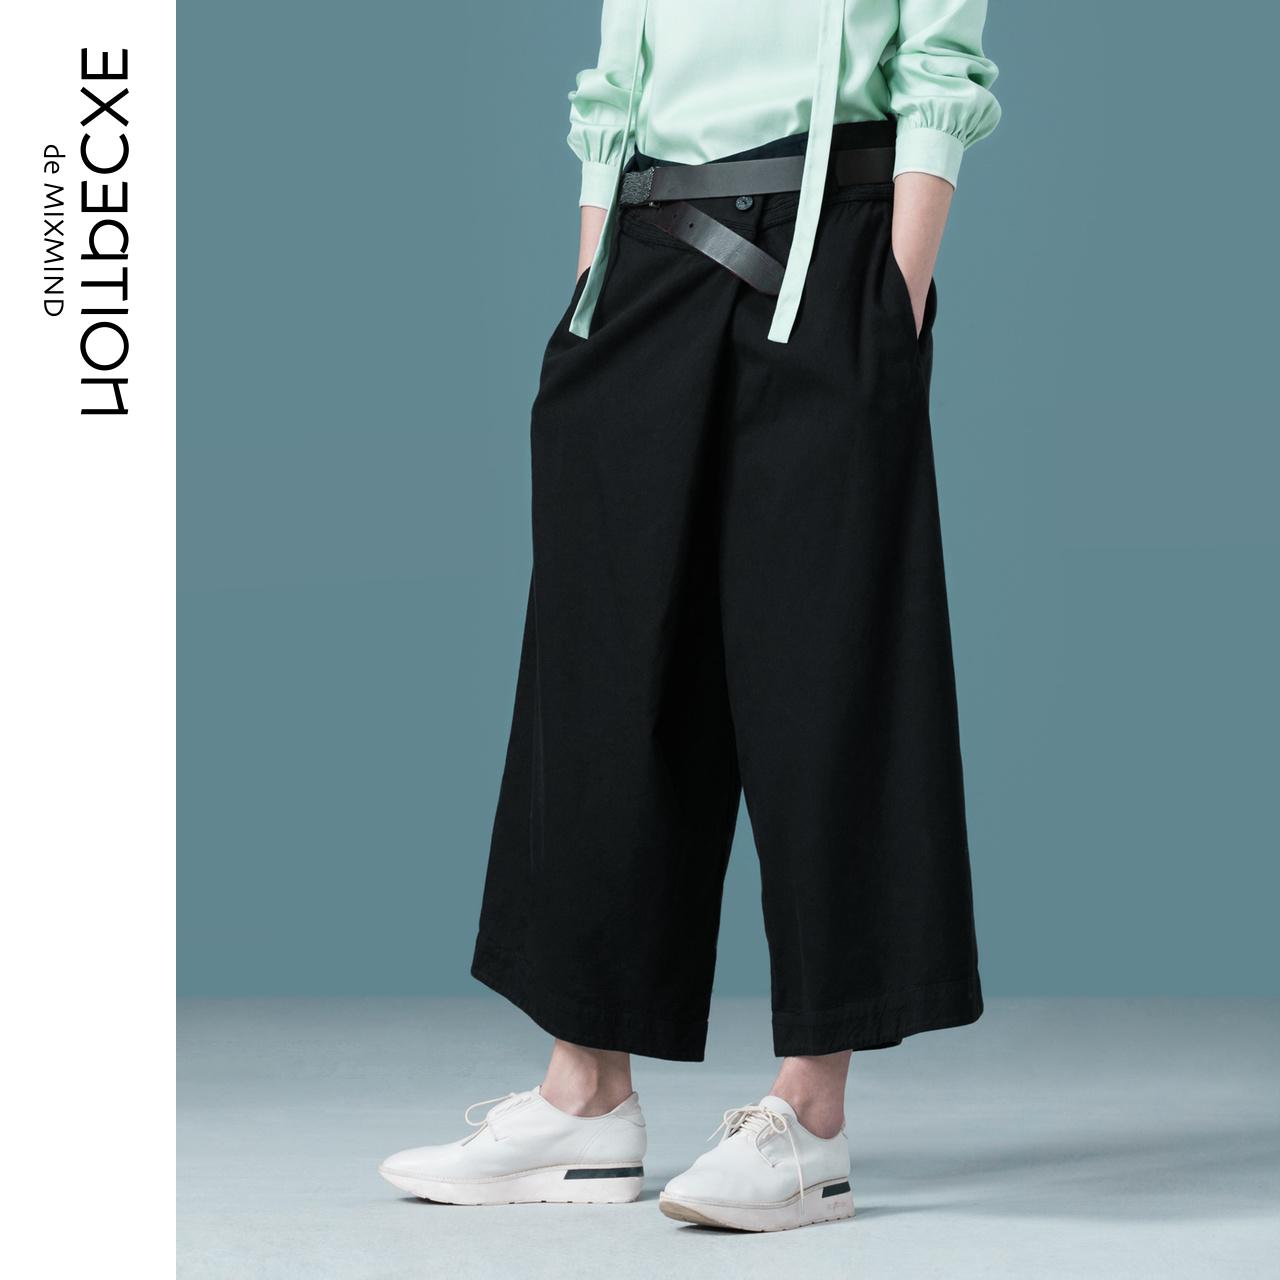 EXCEPTION例外 经典丝绵长裤 女装阔腿裤七分裤垂感宽松休闲女裤